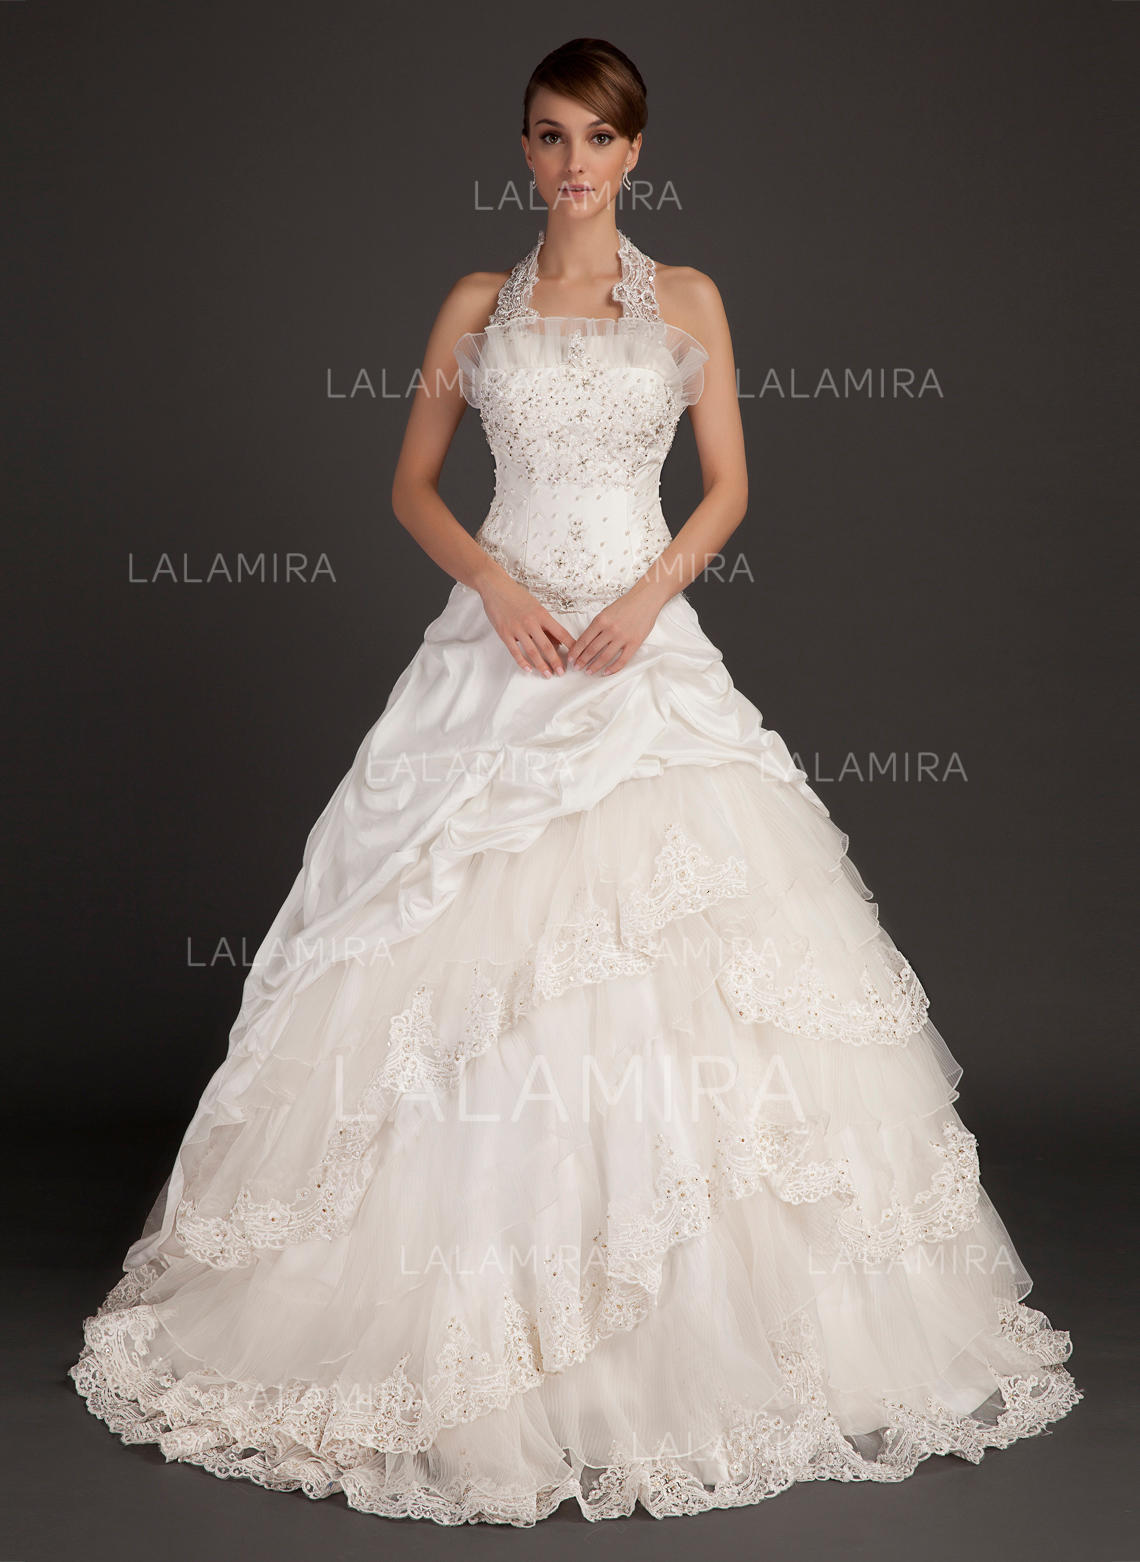 Halter Ball Gown Wedding Dresses Taffeta Lace Beading Sleeveless